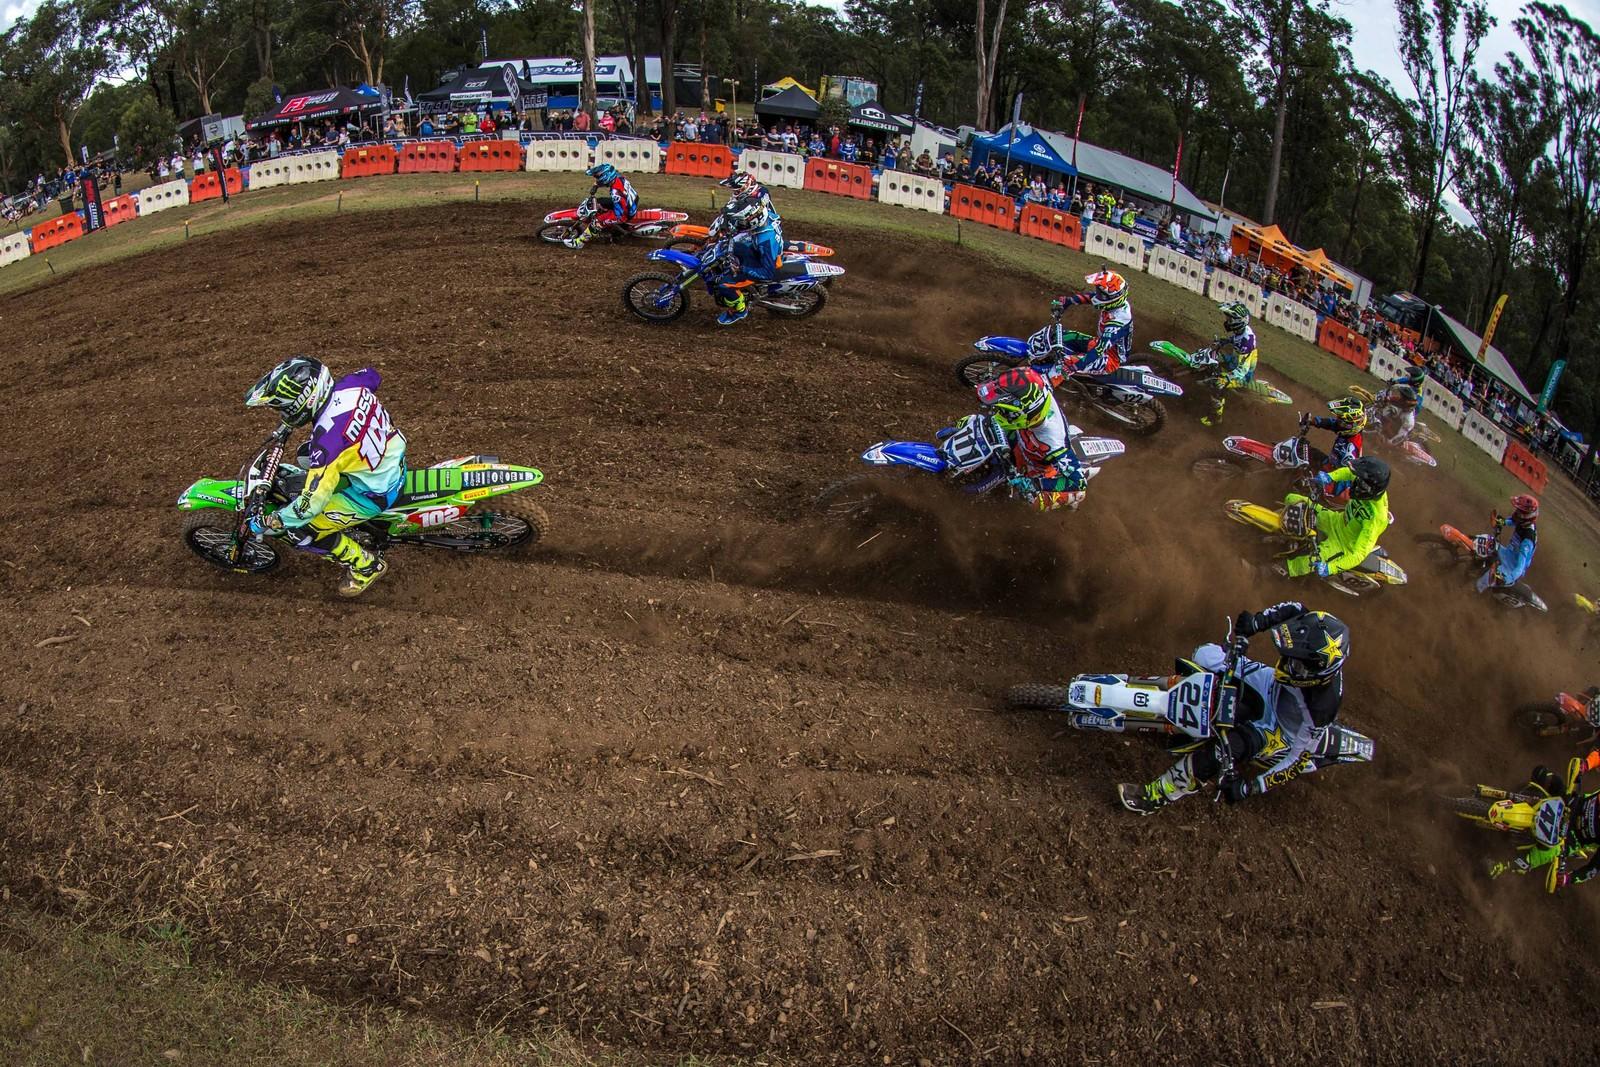 450 race one start - Australian Motul Motocross Nationals Round 2, Appin - Motocross Pictures - Vital MX